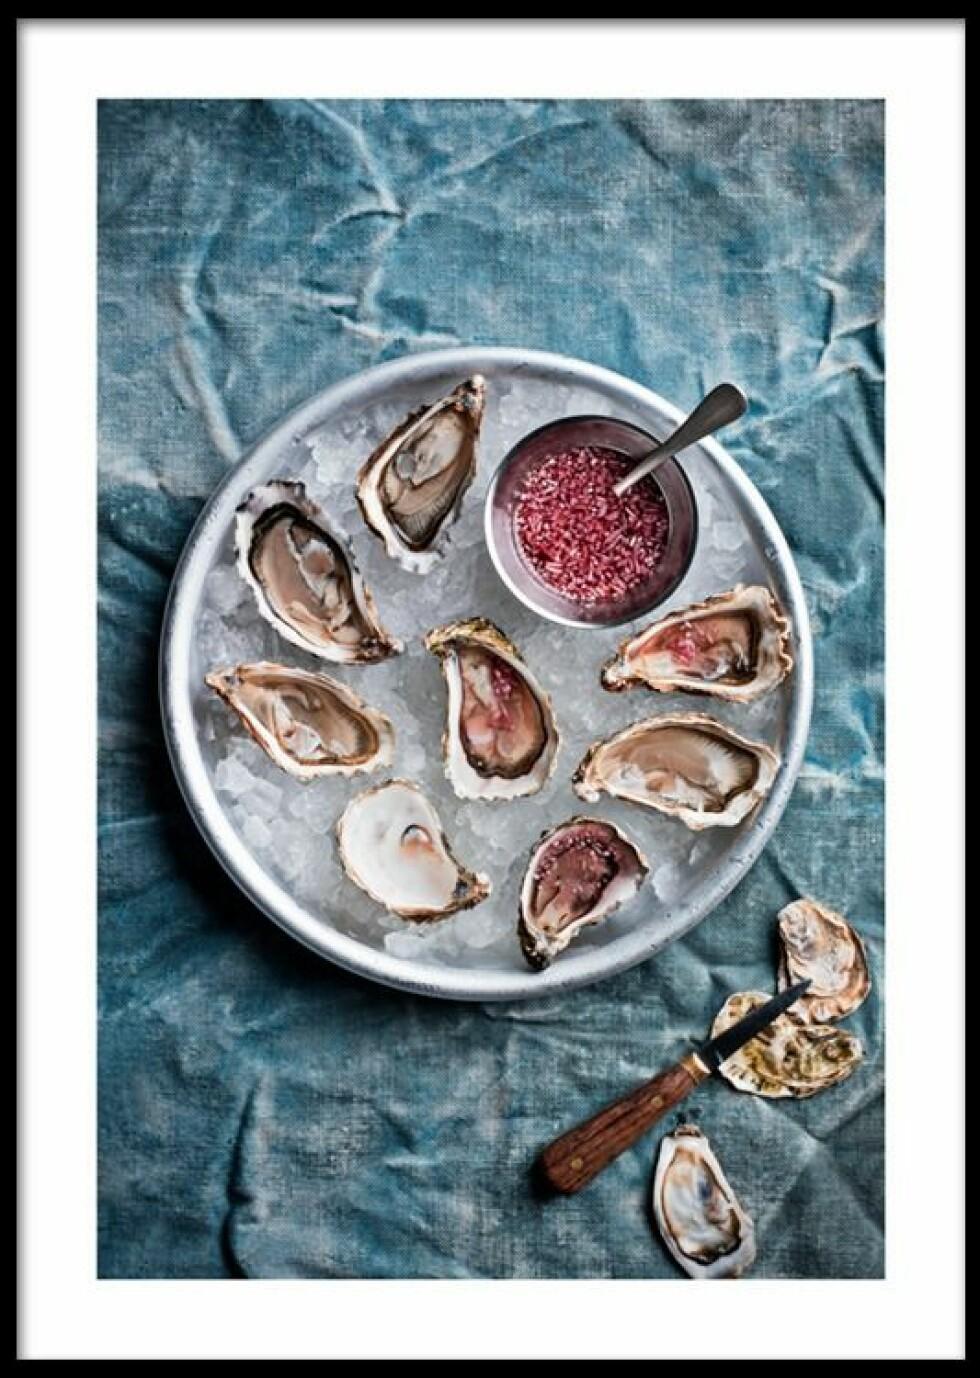 "Plakat ""oyster"" |129,-| https://desenio.no/no/artiklar/oysters-plakat.html"